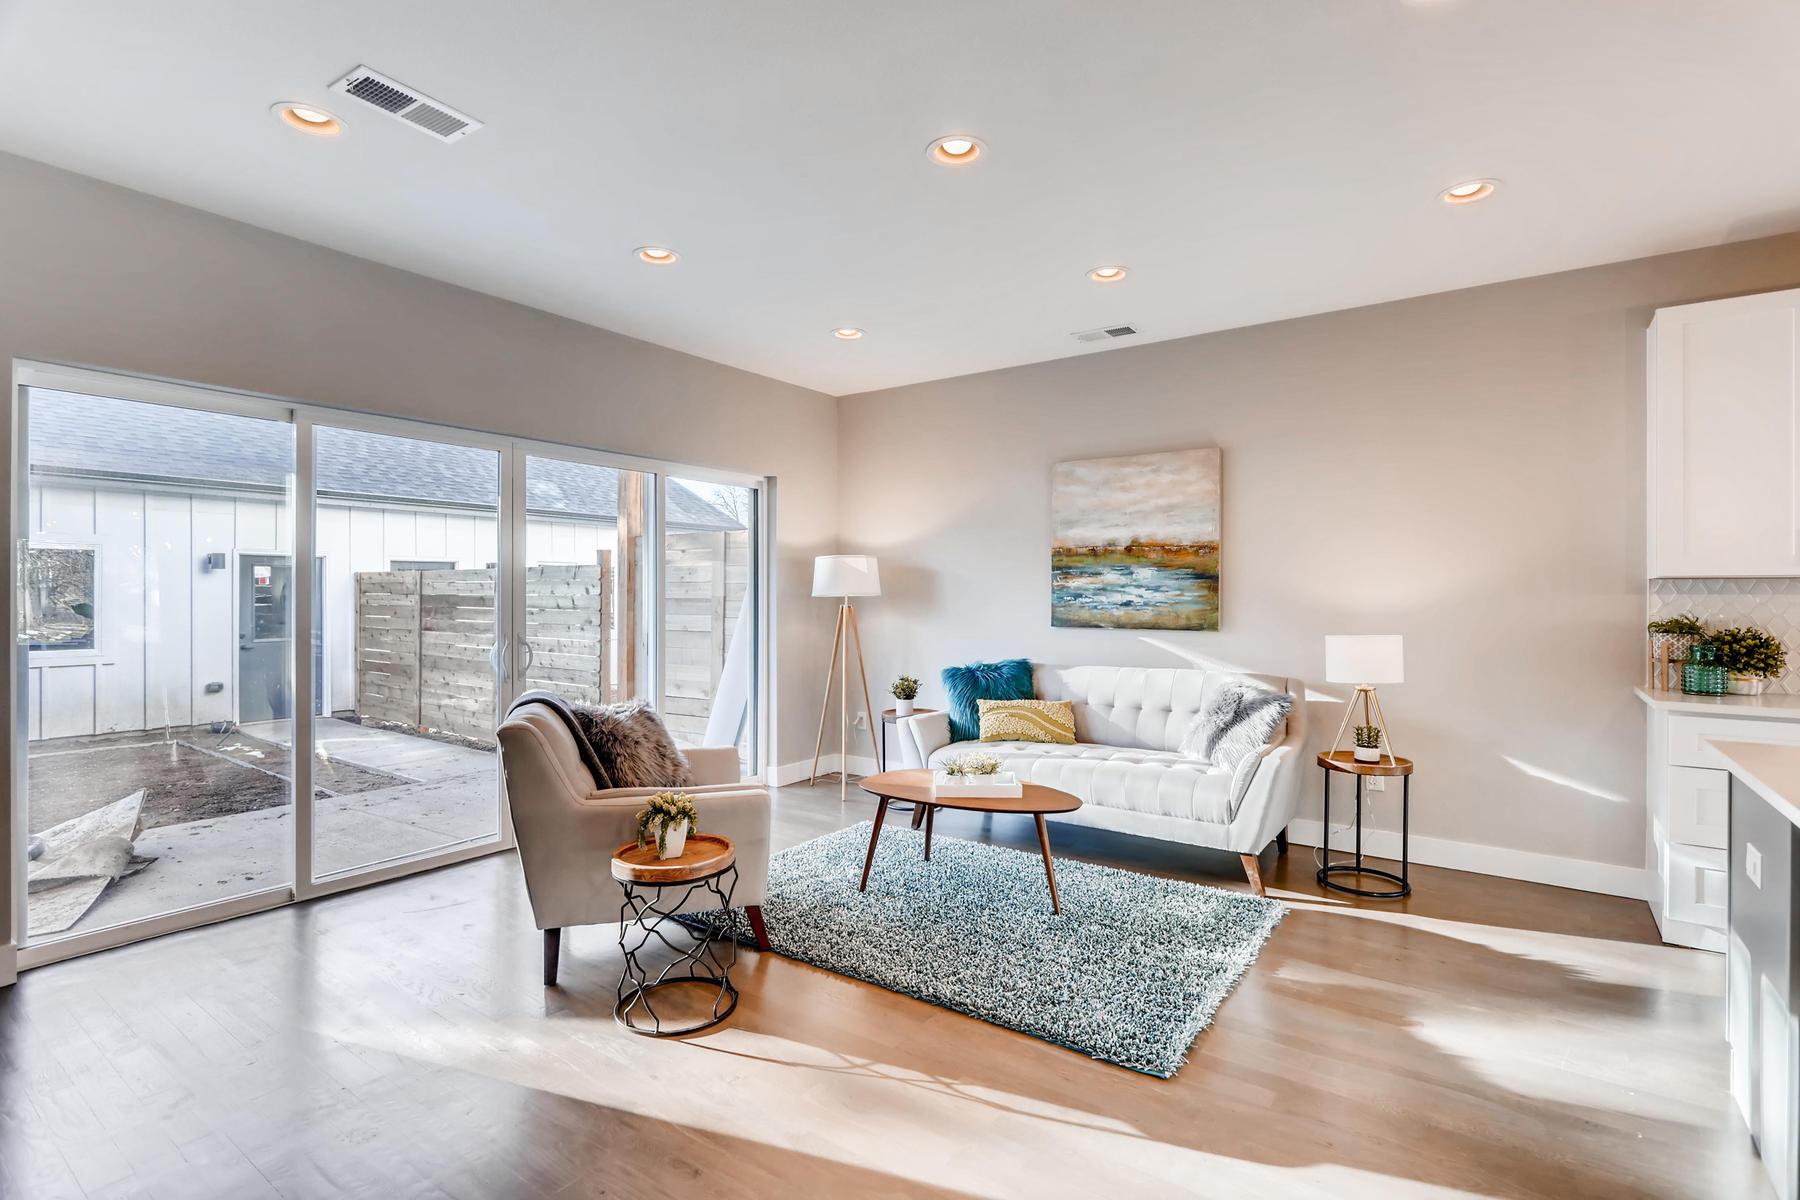 3105 S Cherokee St Englewood-006-15-Living Room-MLS_Size.jpg